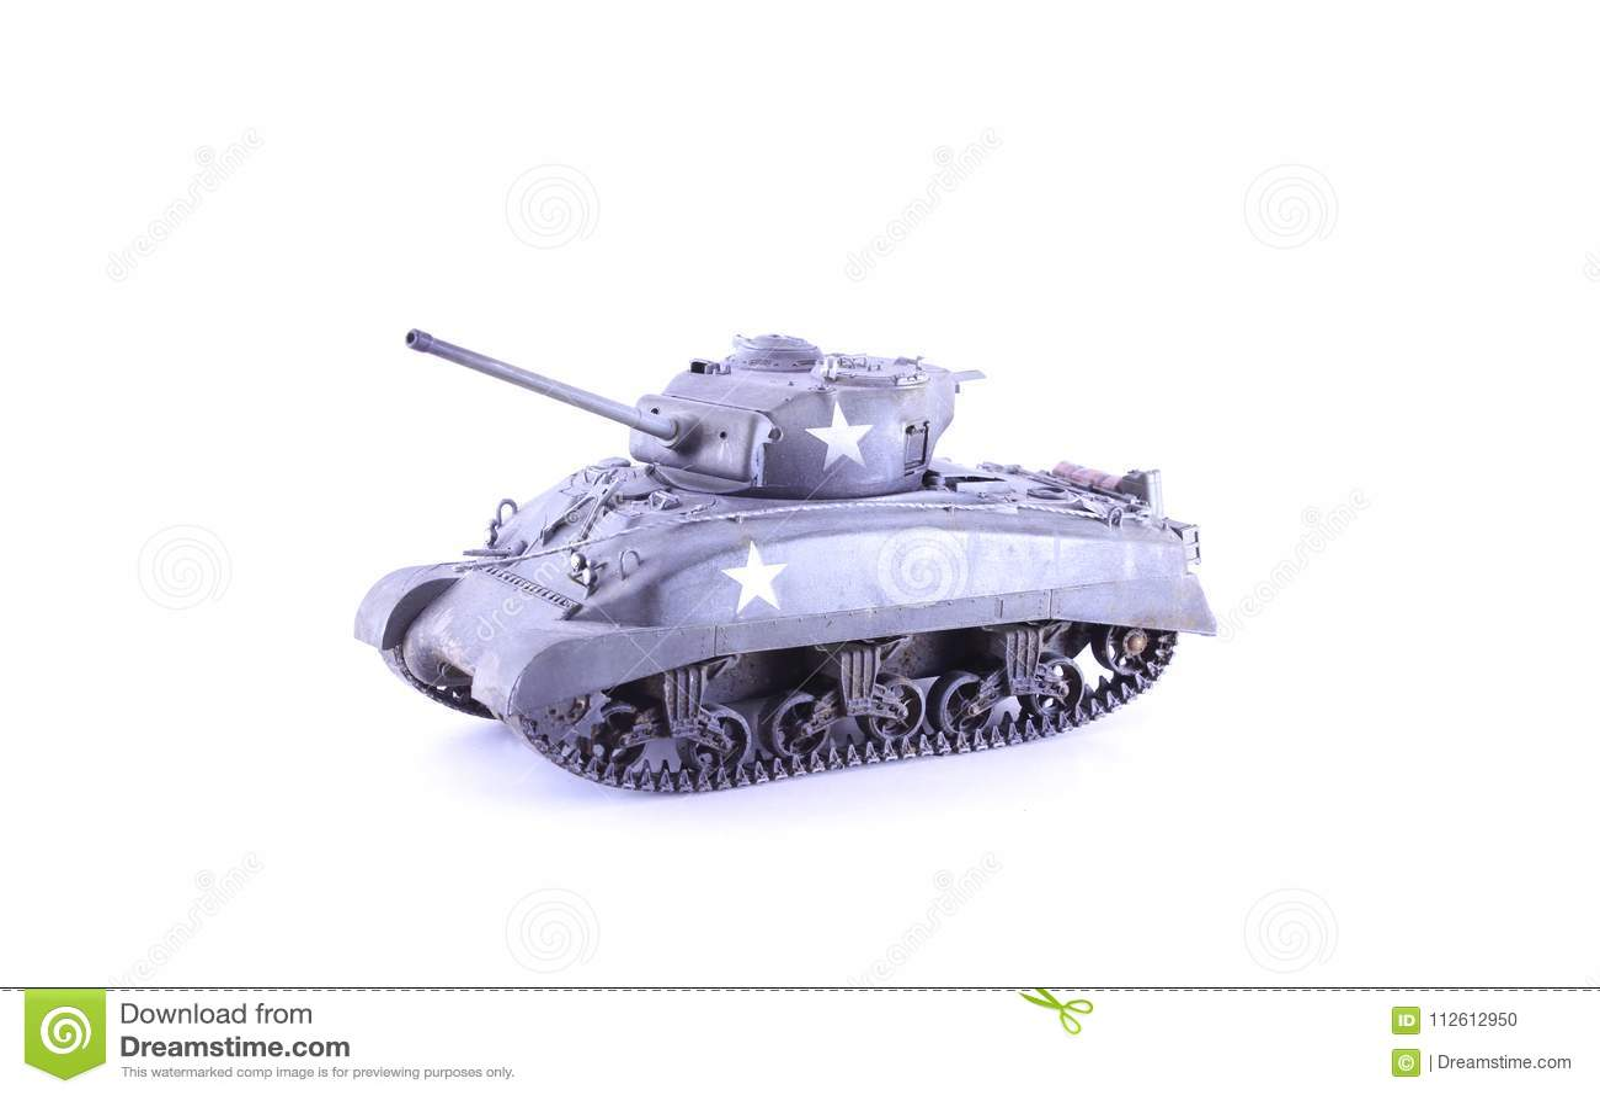 Army Military Tank Model Sherman Stock Photo - Image of